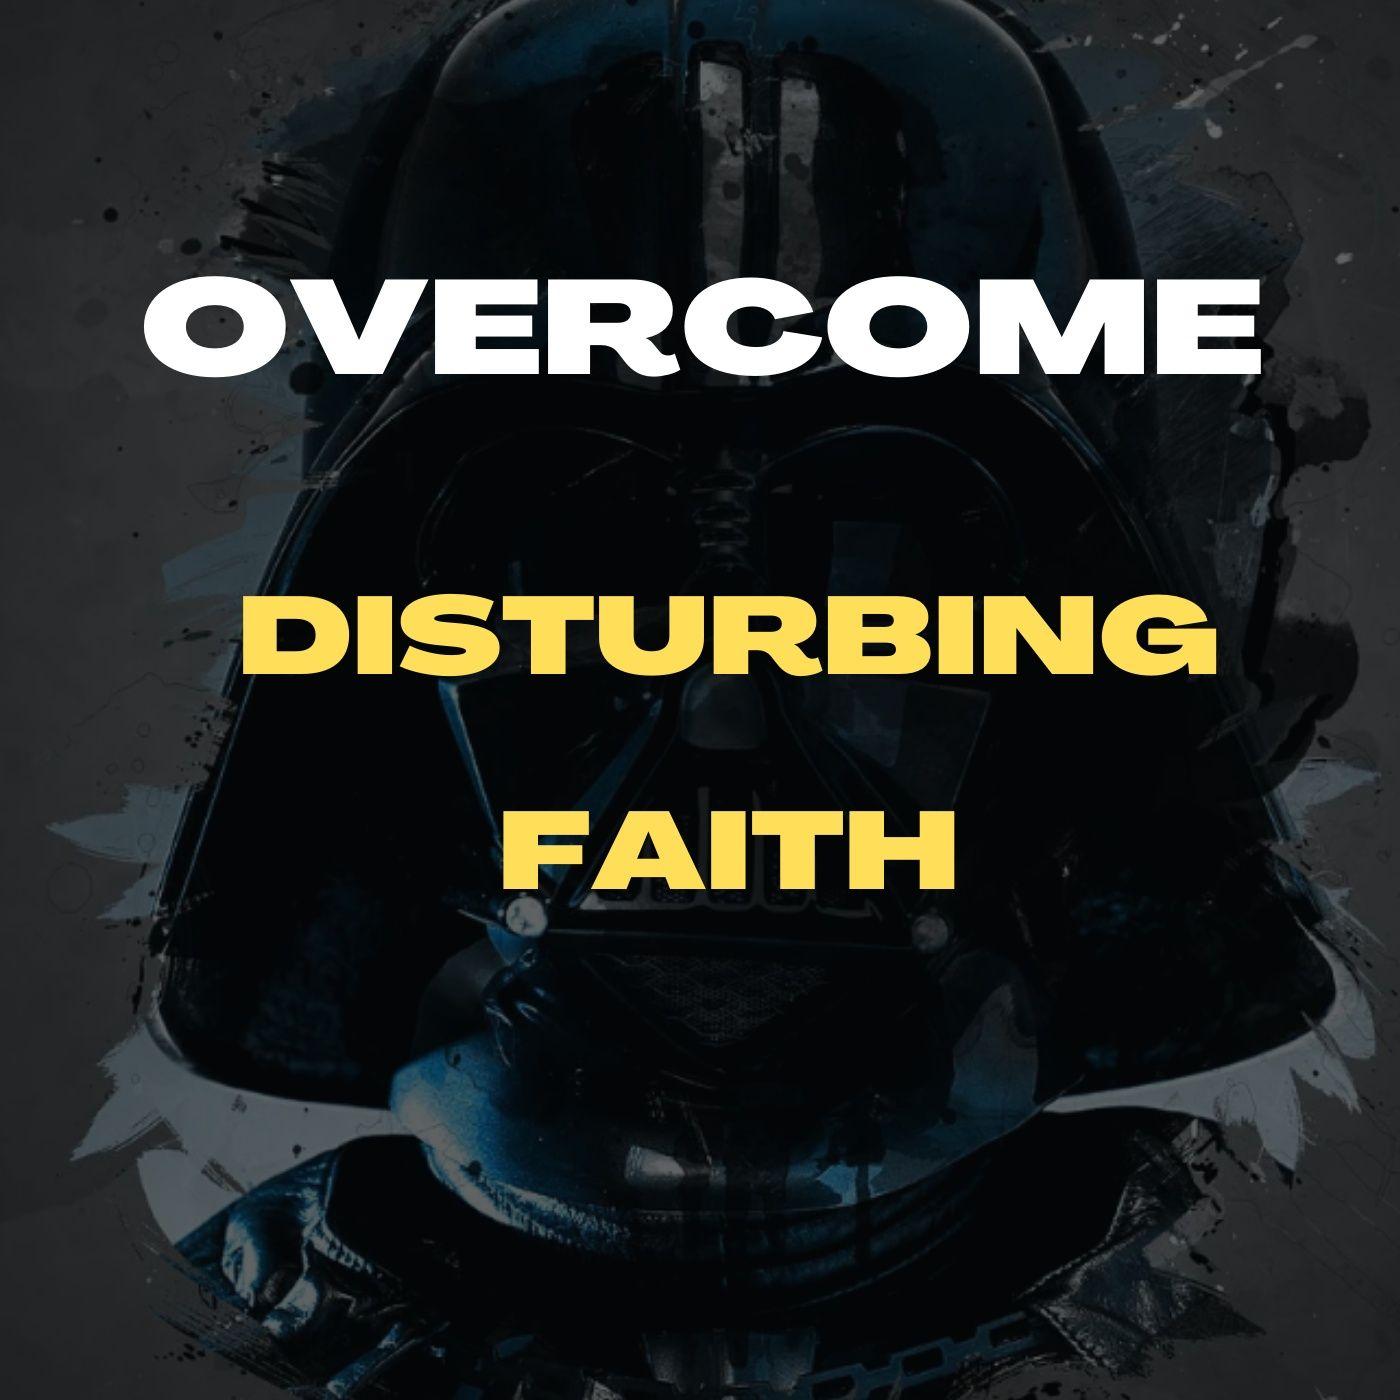 Overcome Disturbing Faith